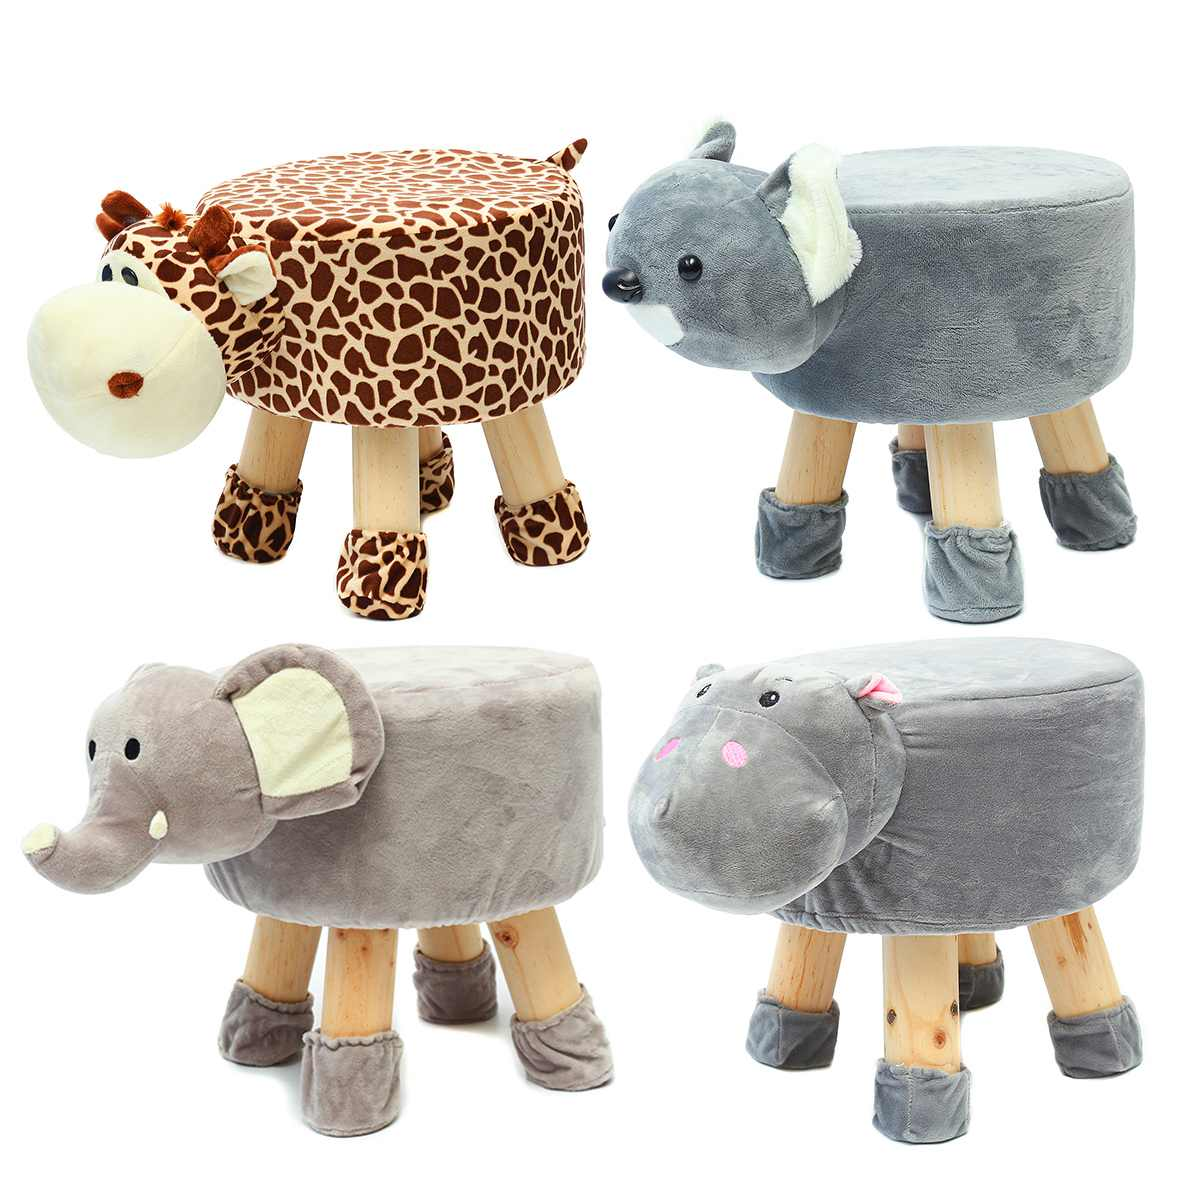 Portable Children's animal stool solid wood shoes ben ch cute cartoon stool Animal Footstool Ottoman Footrest Stool